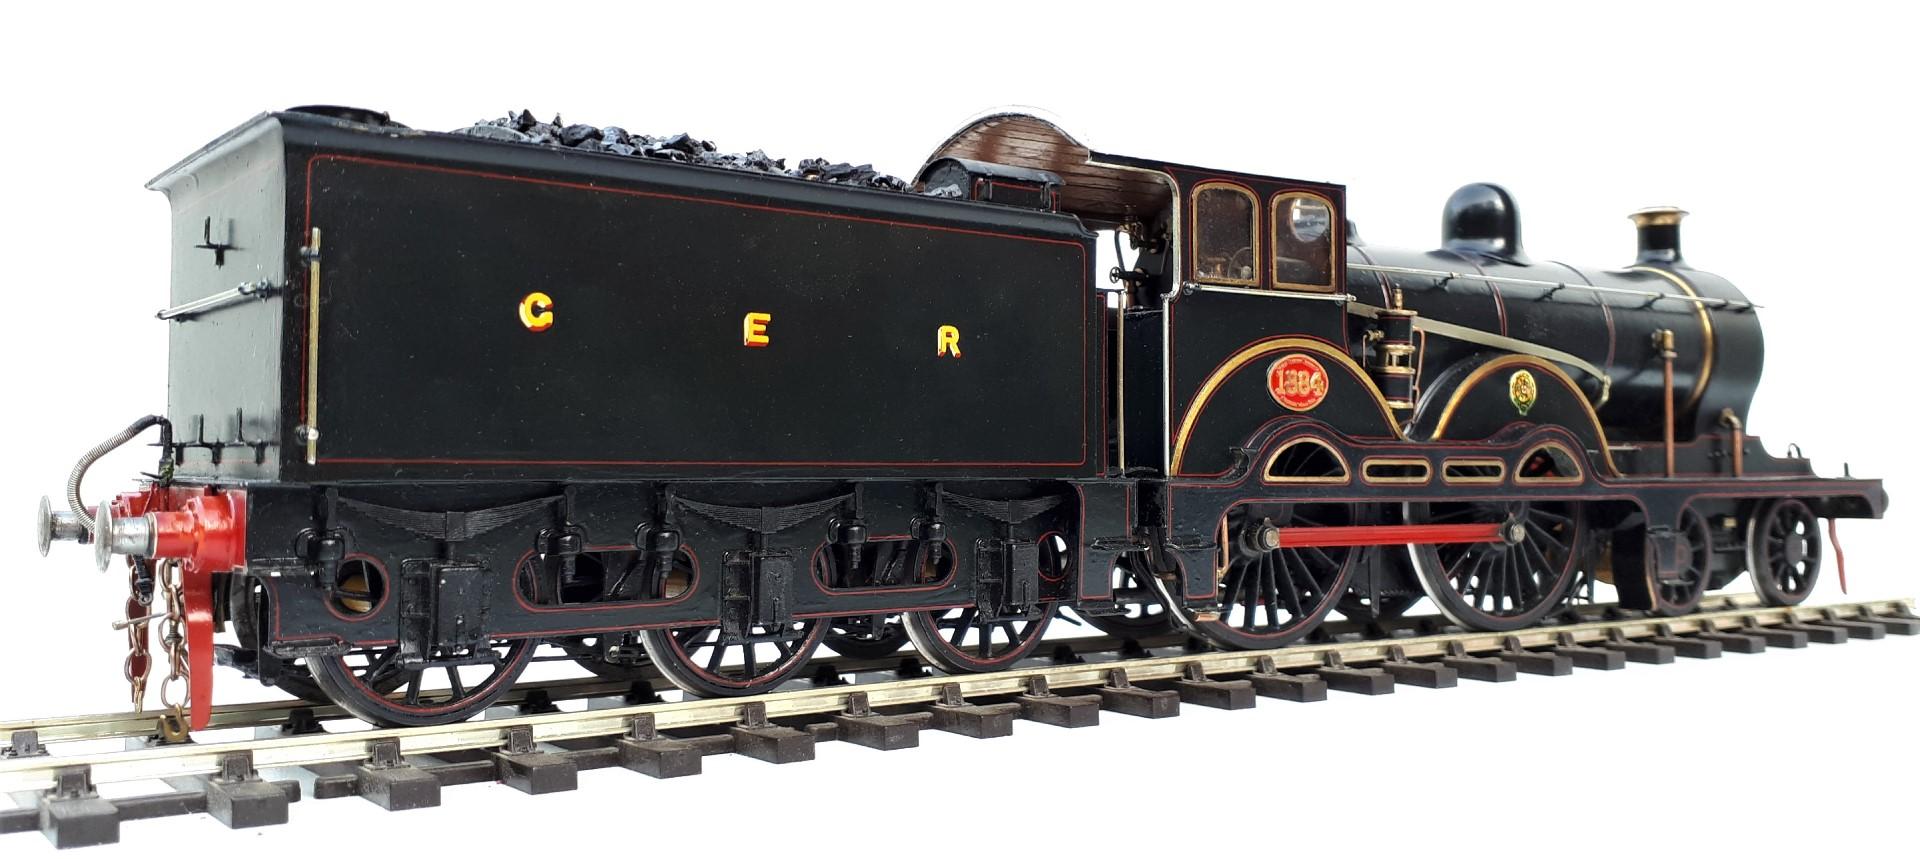 GER 1884